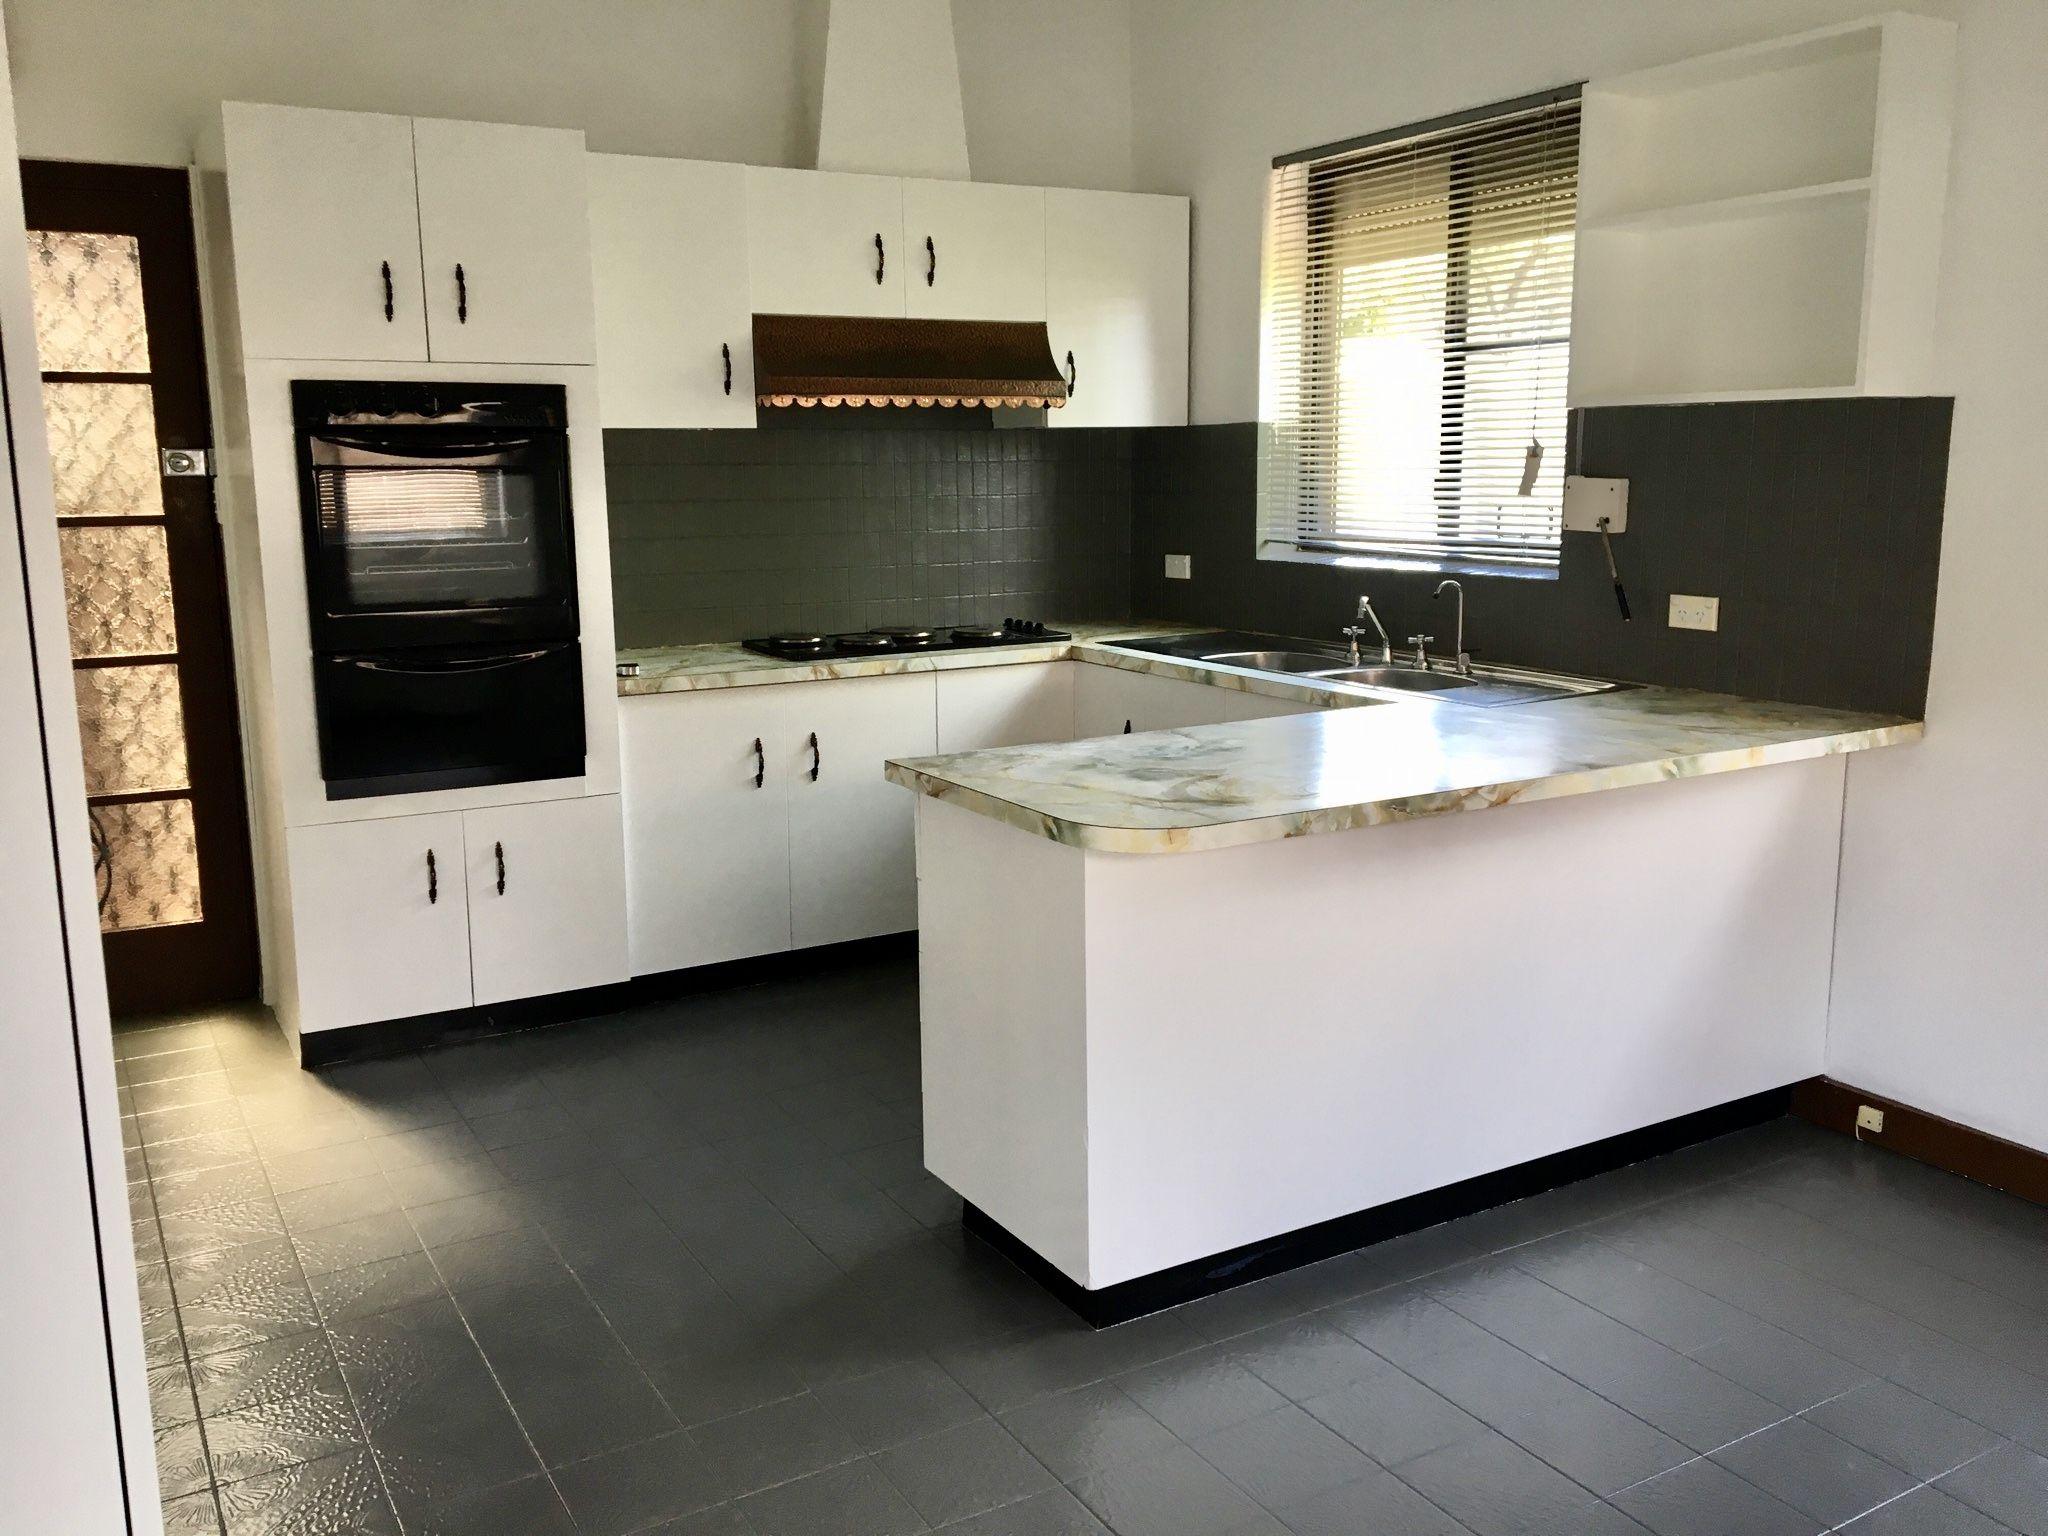 20 Frances Avenue, Strathfield South NSW 2136